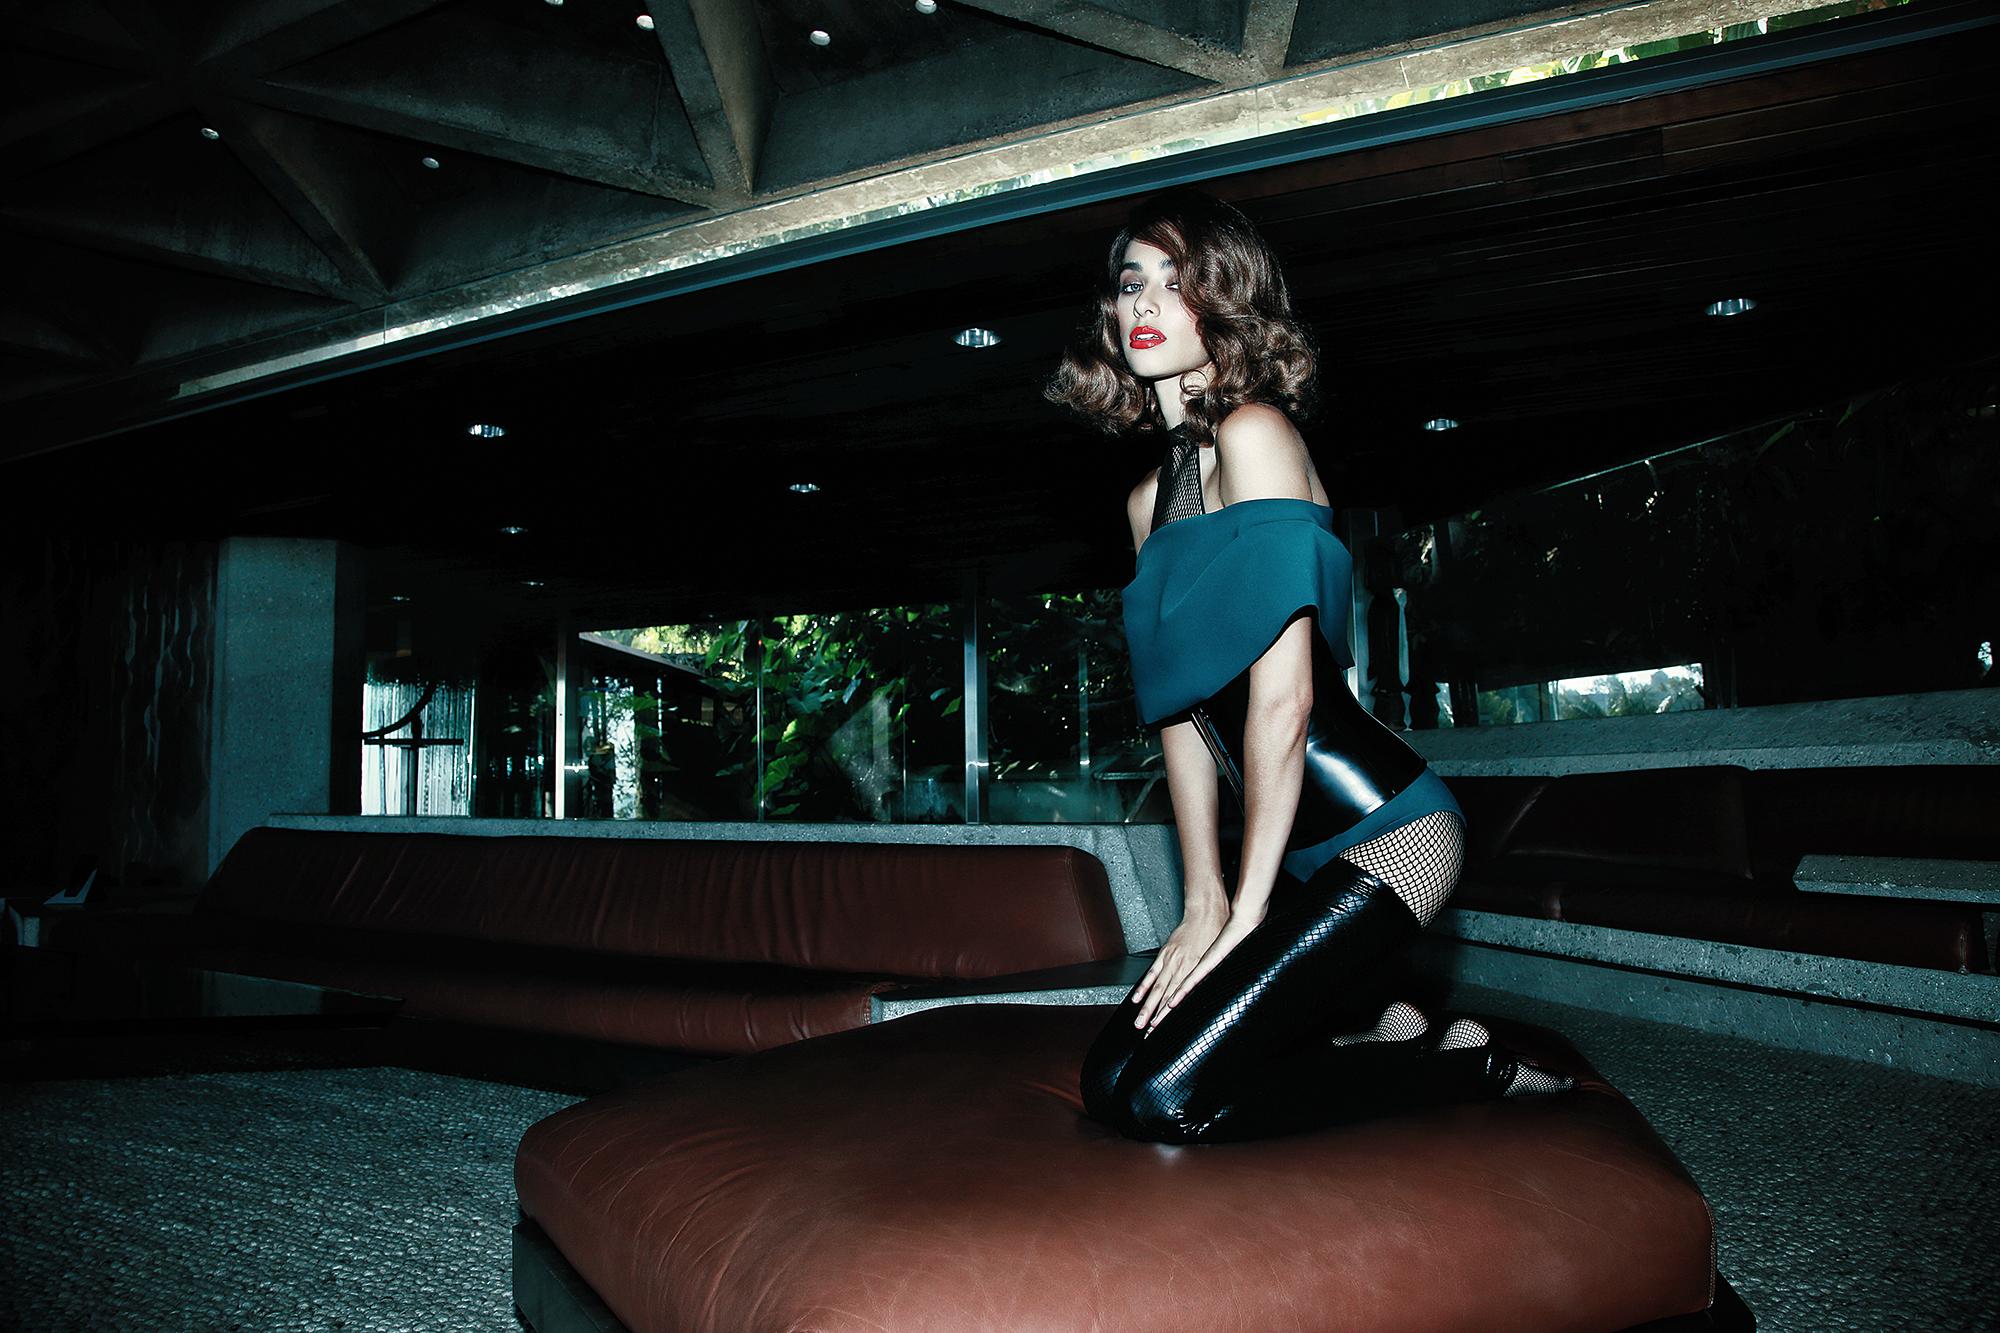 Bodysuit  GRETA CONSTANTINE . Stockings and corset  HOUSE OF ETIQUETTE . Bodystocking  TRASHY LINGERIE .